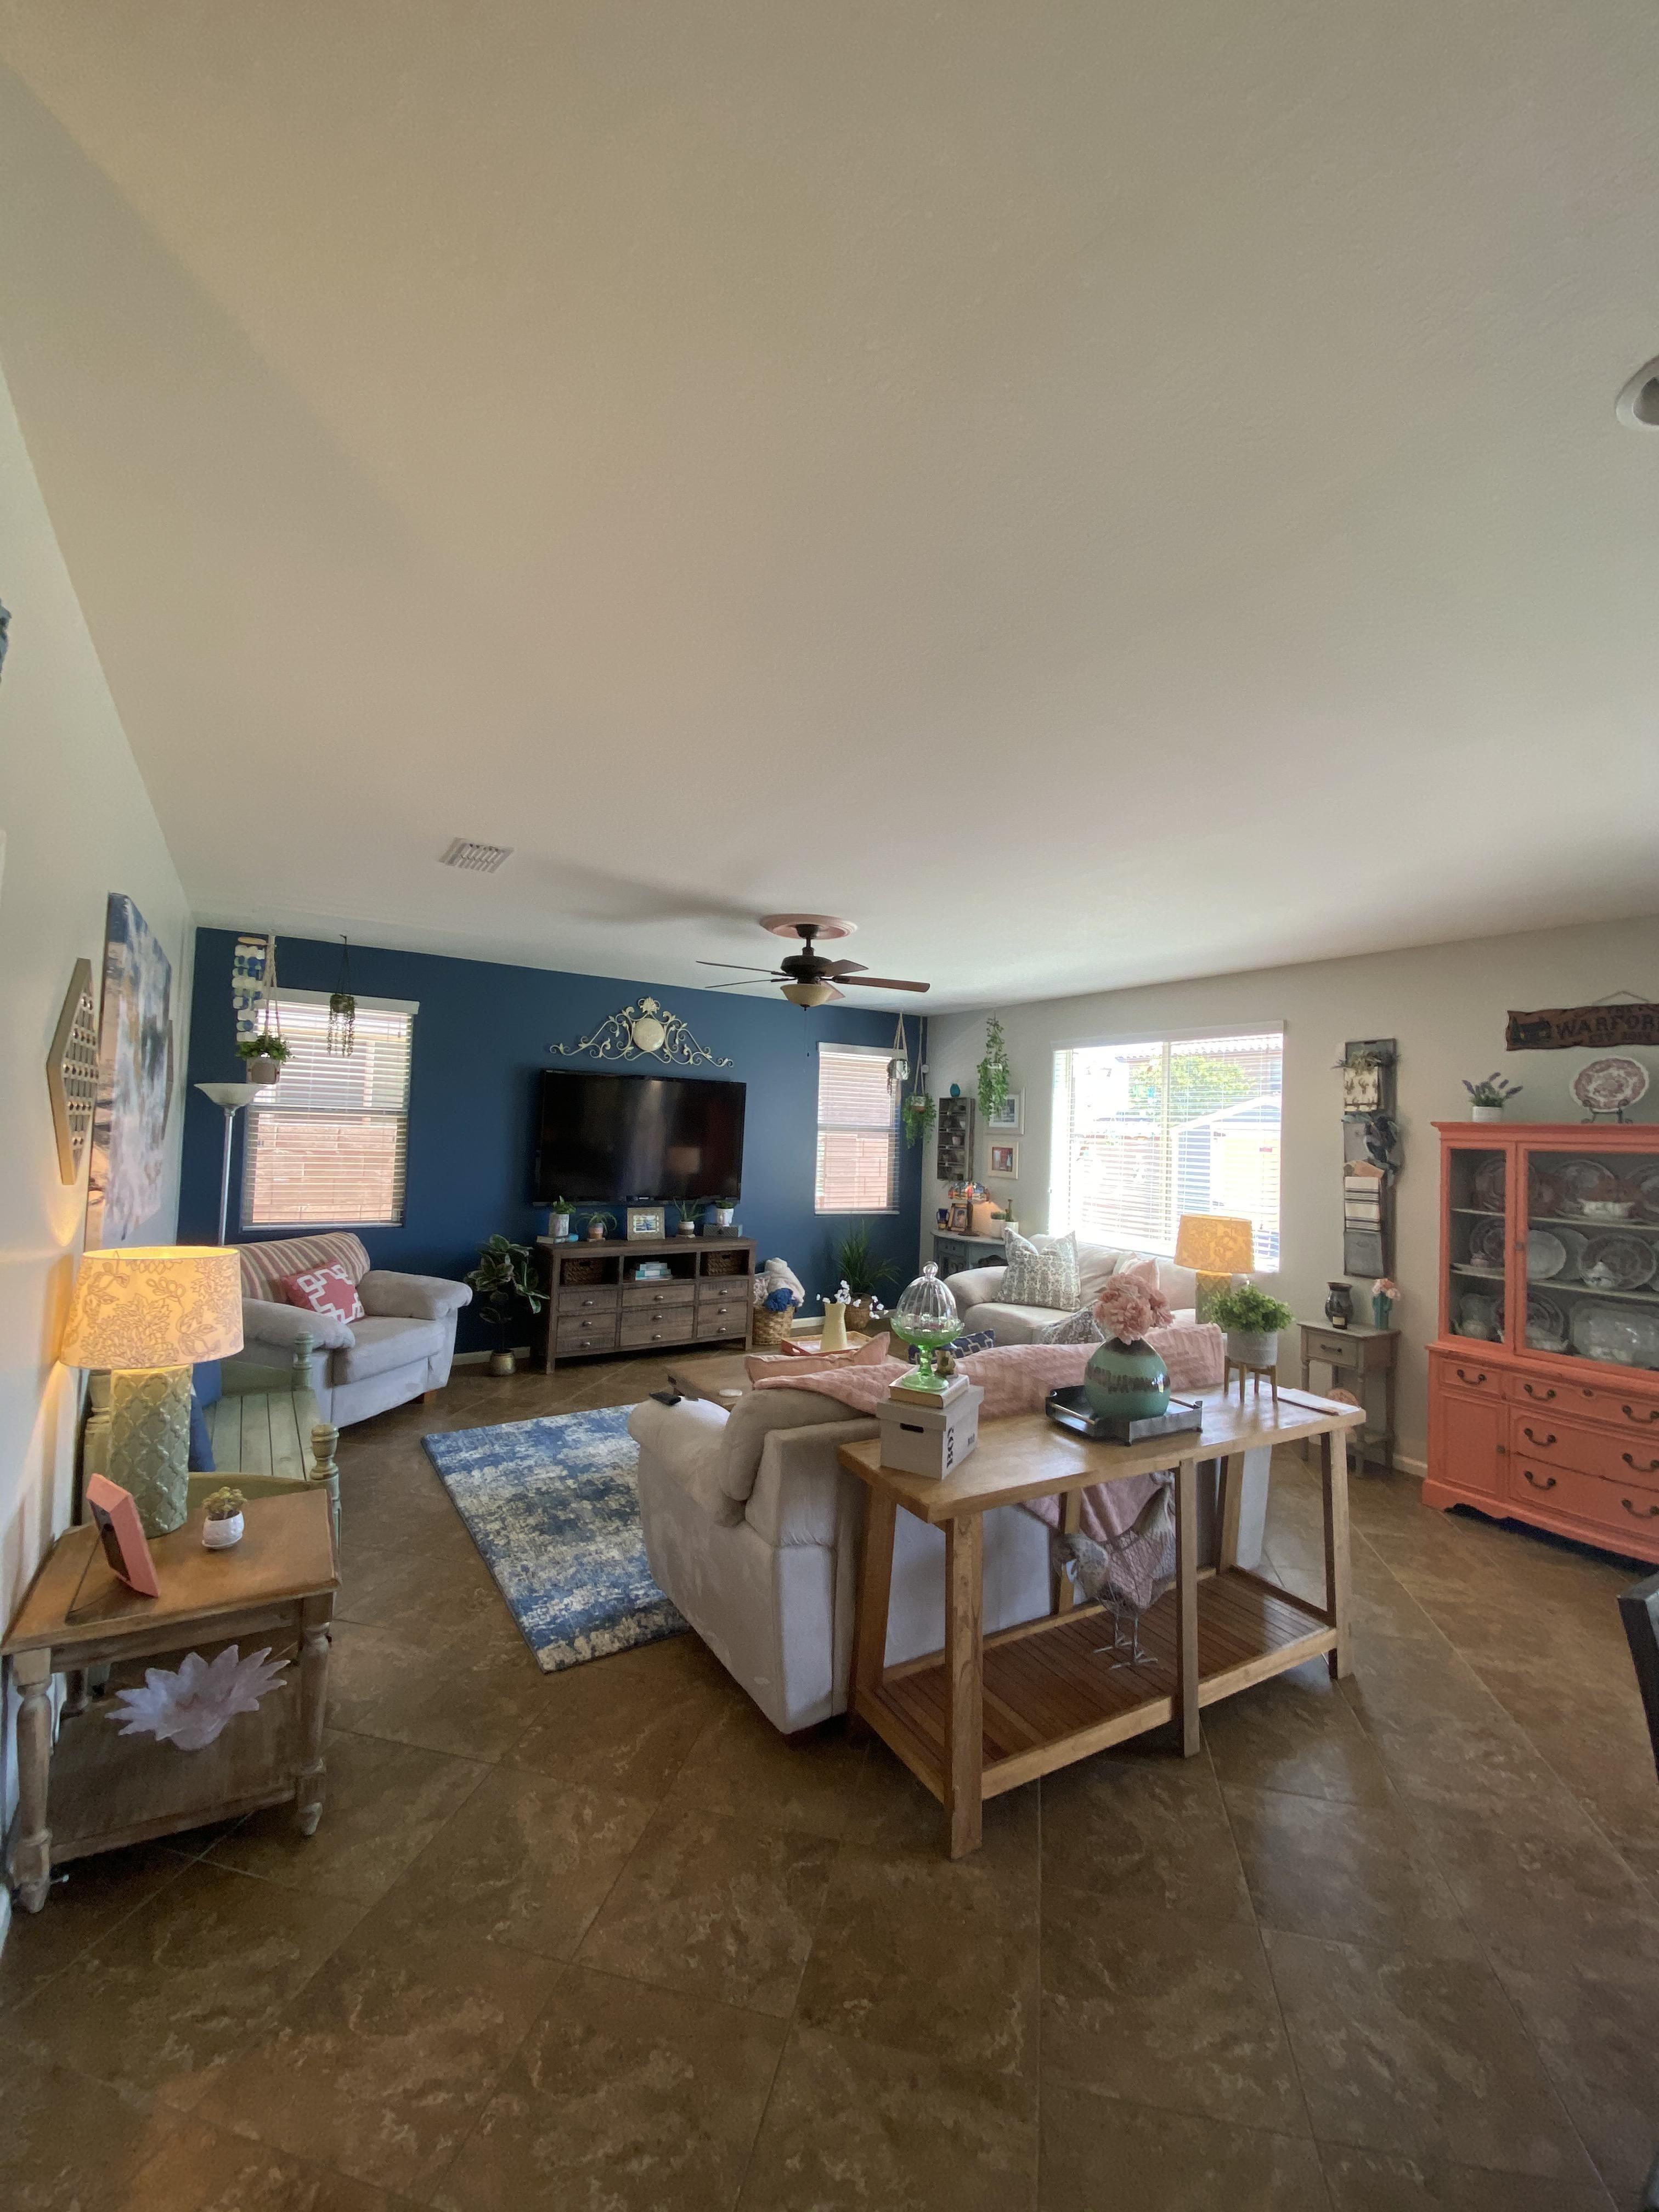 My living room in Phoenix AZ #home #homedesigns #design #homeideas #roomideas #room #rooms #house #housedesigns #roomdesigns